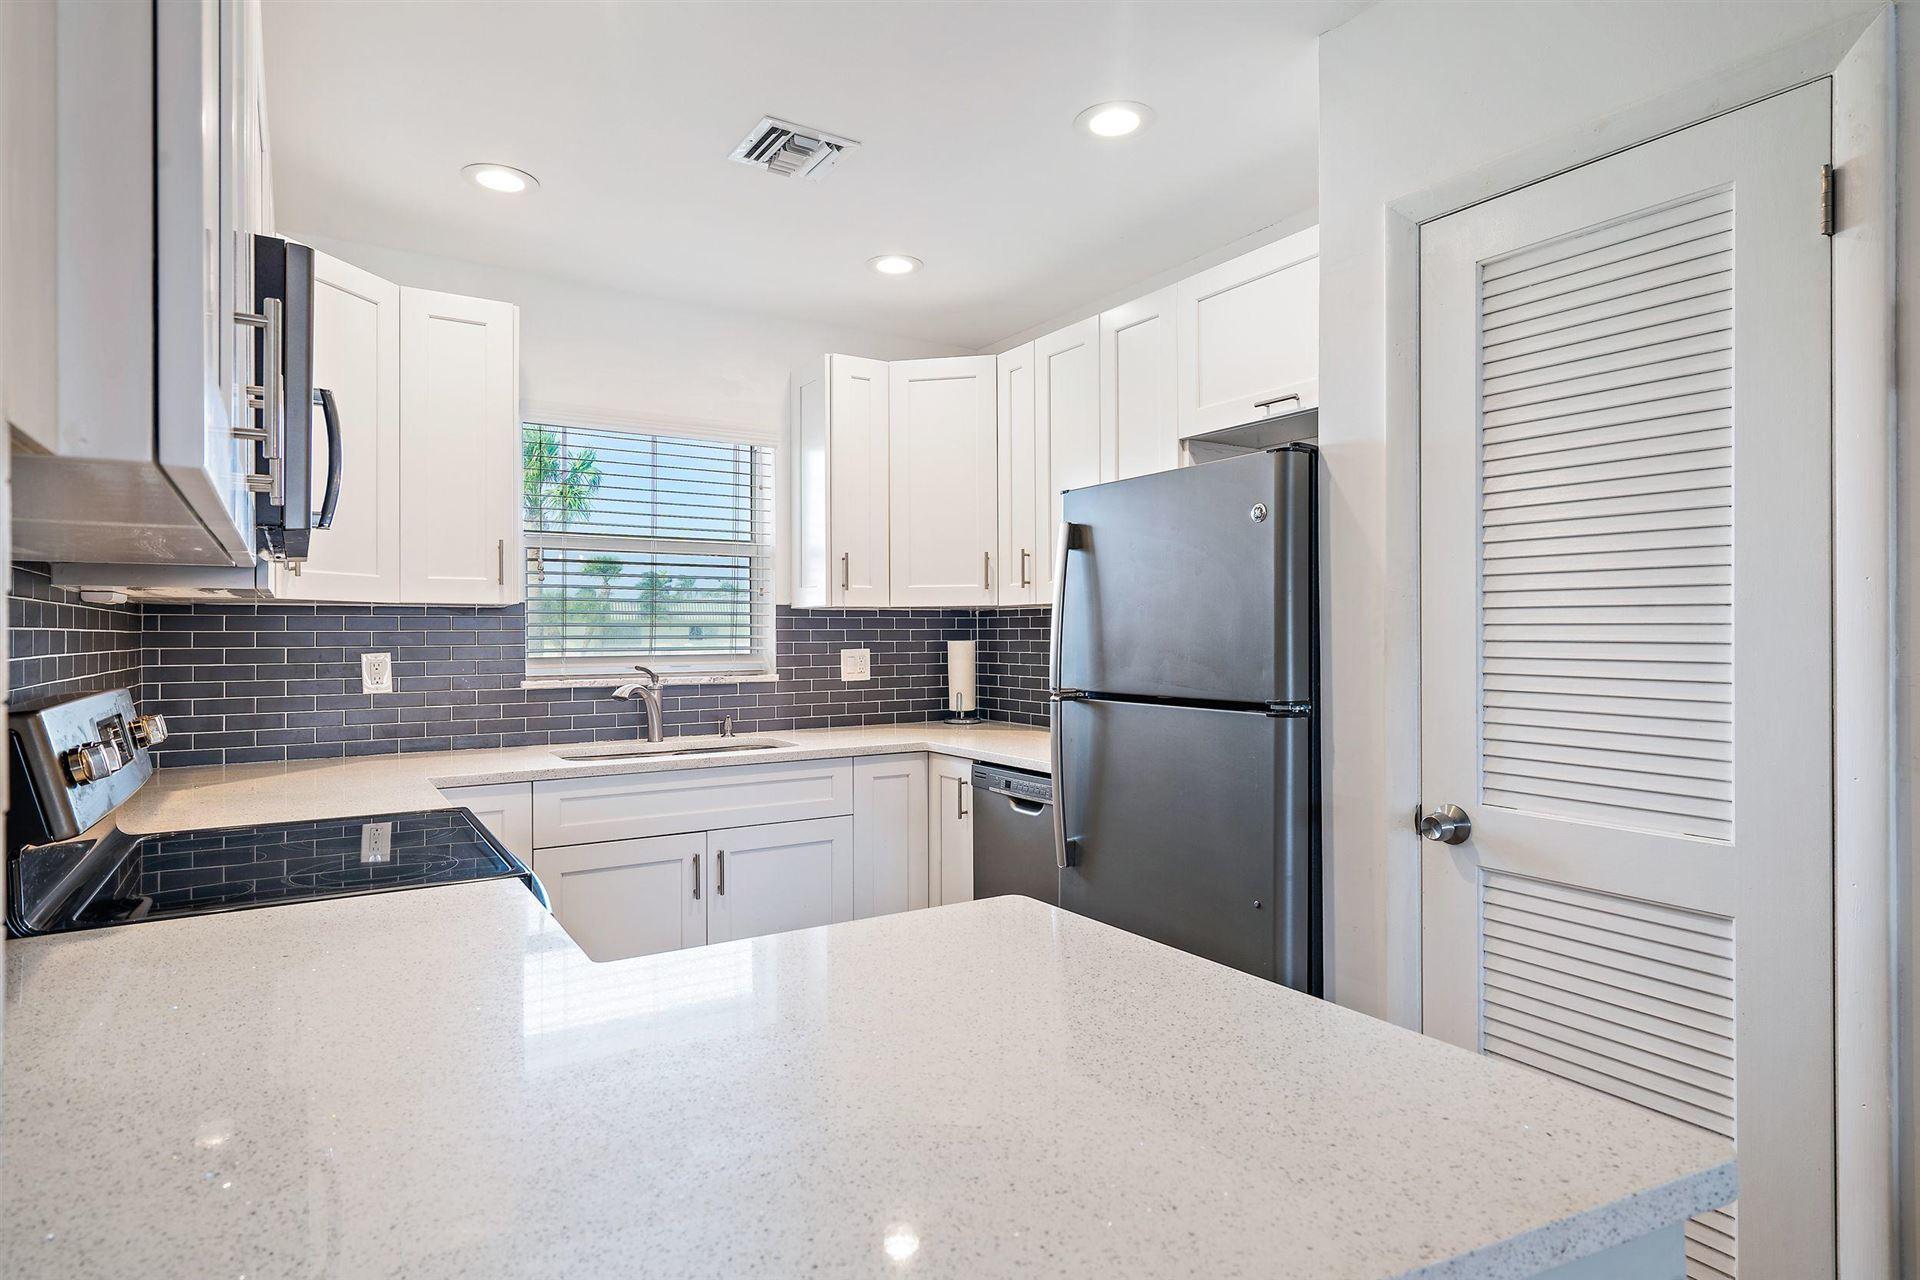 Photo of 110 Wettaw Lane #206, North Palm Beach, FL 33408 (MLS # RX-10671131)